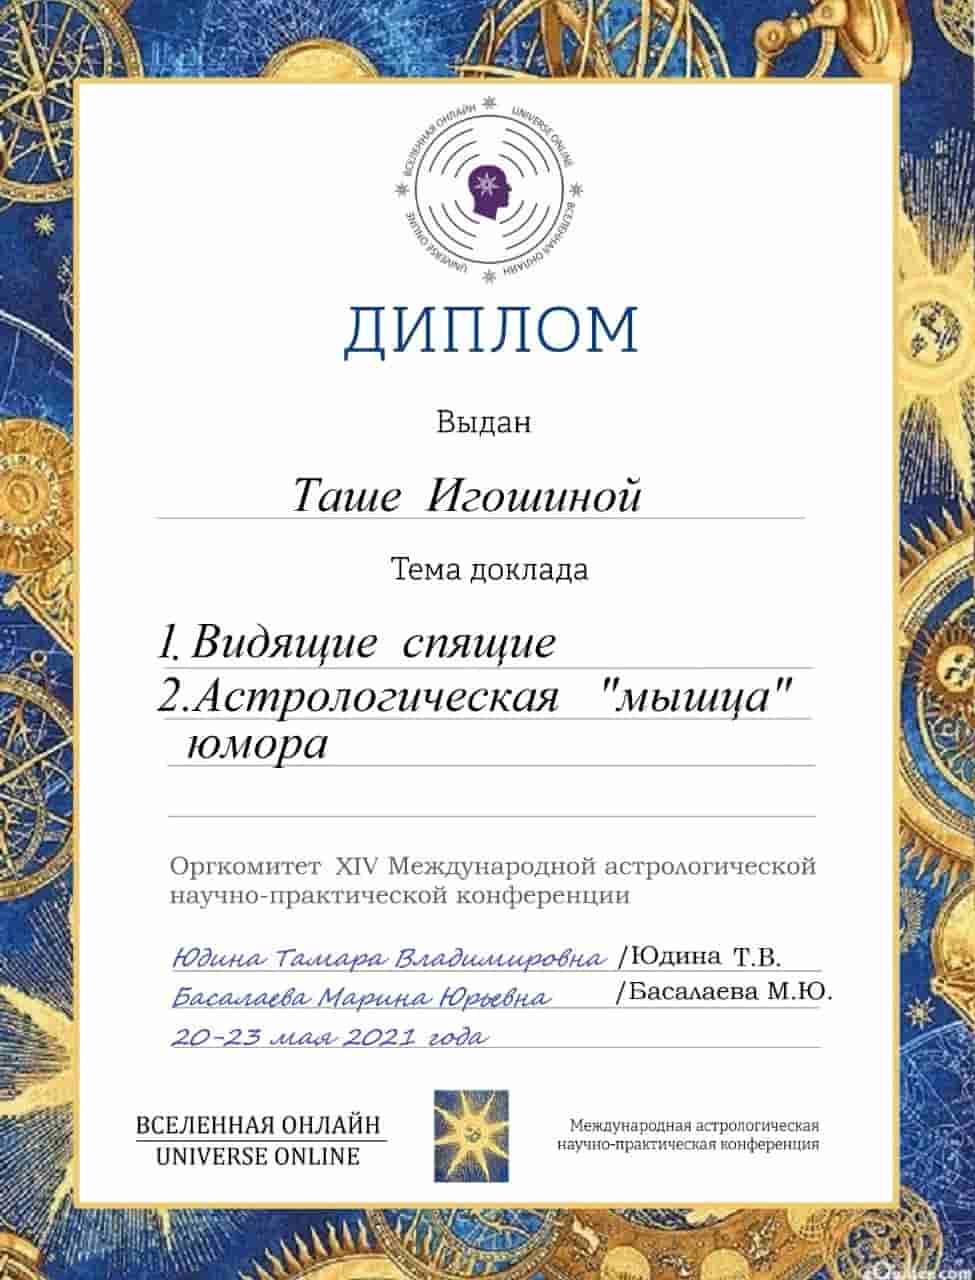 https://astrologtasha.ru/wp-content/uploads/2021/06/diplom-sp.jpeg